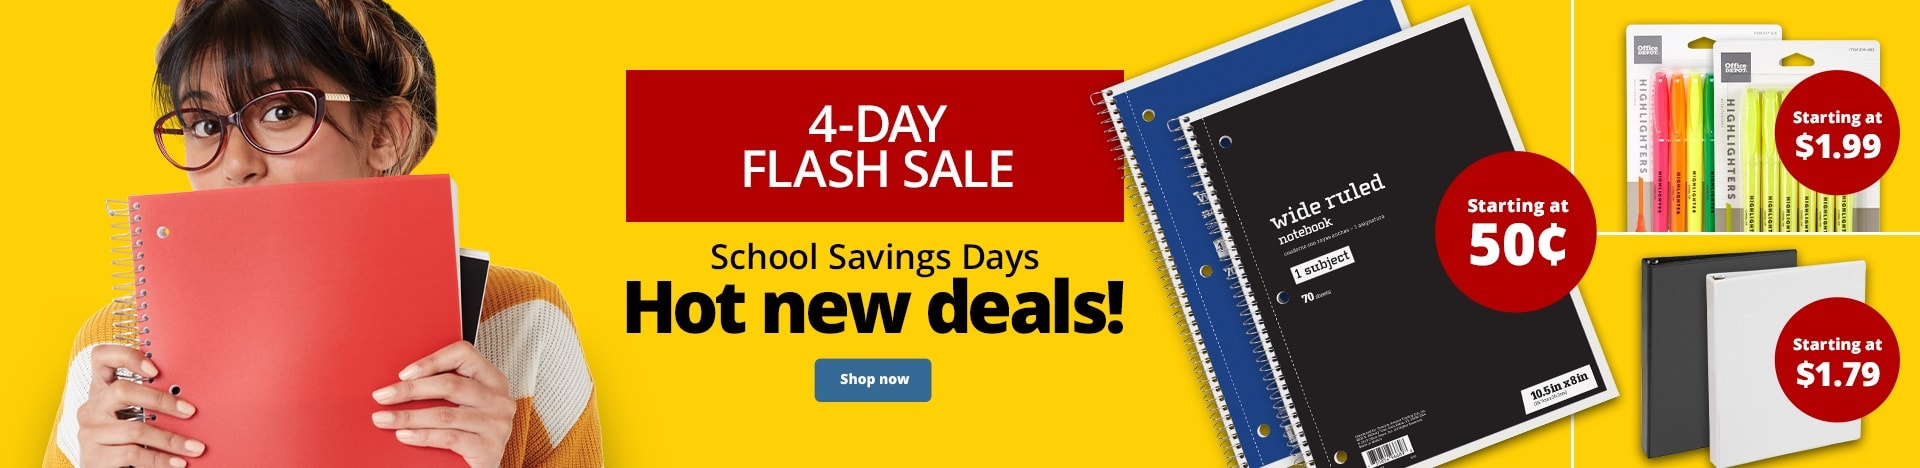 4-Day Sale. School Savings Says. Hot new deals each week